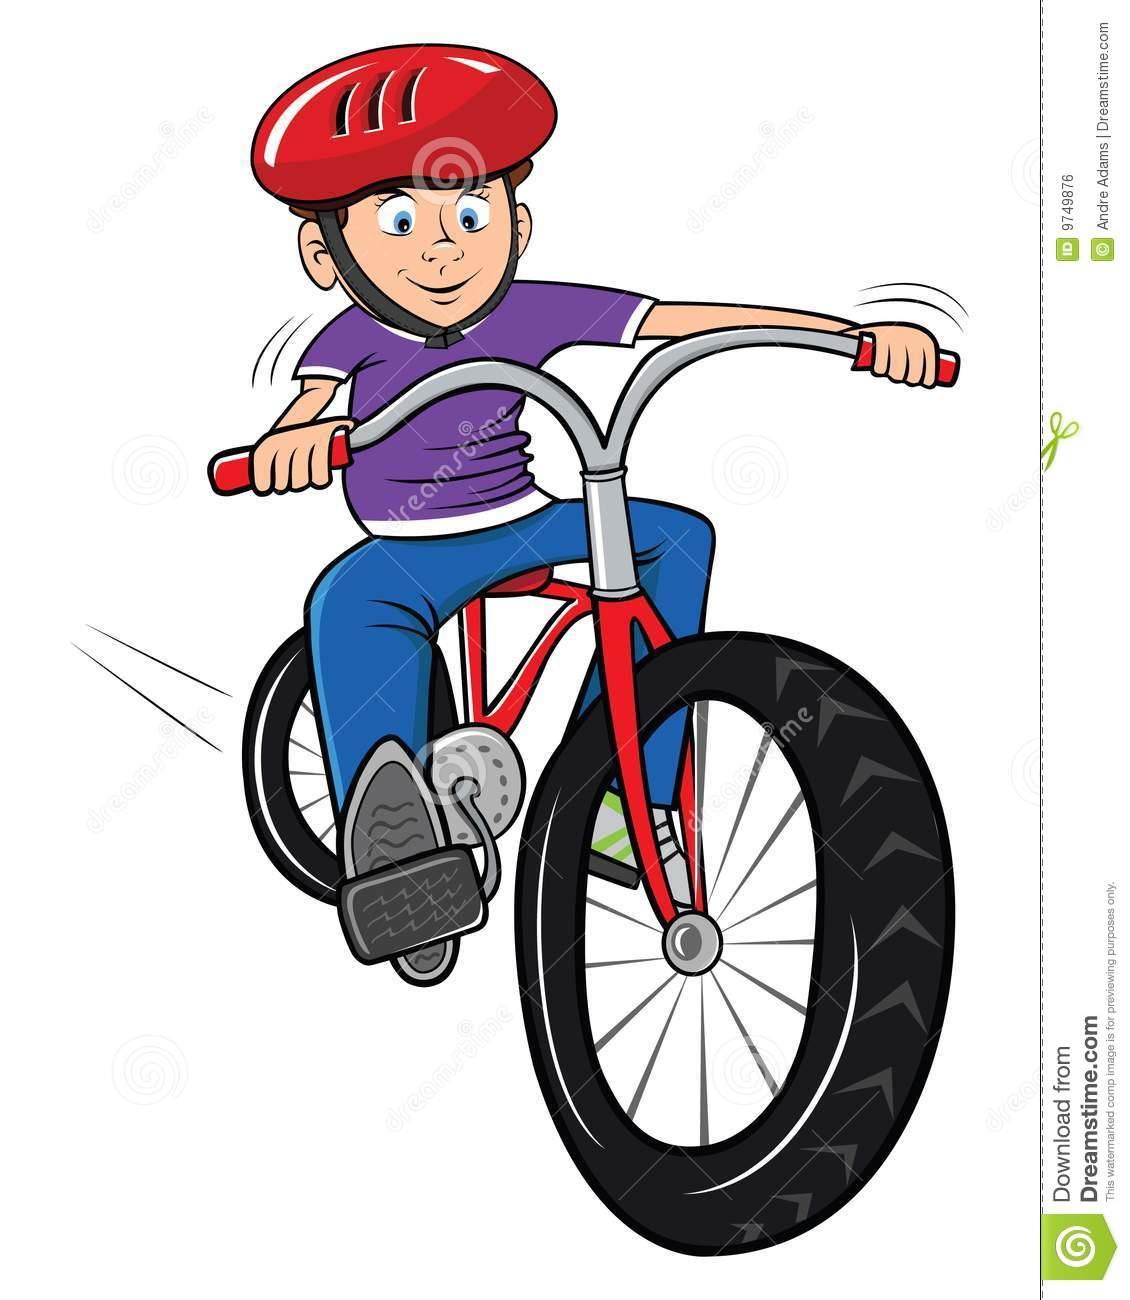 Bike clipart his Clipart Clipart #14 Clipart 20clip